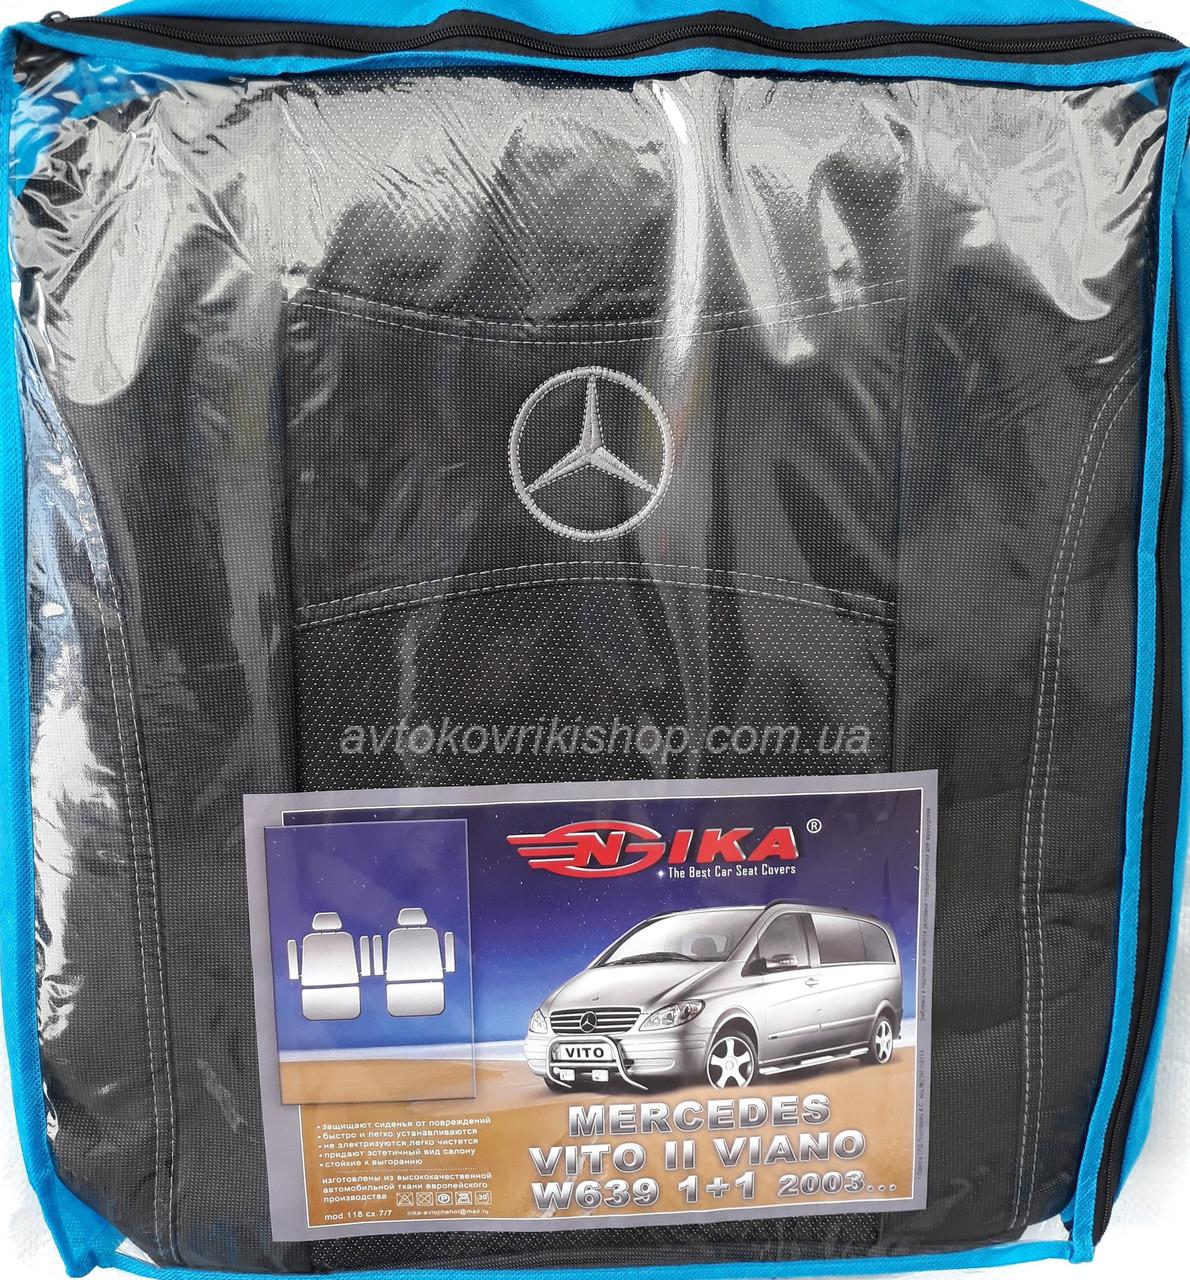 Авточехлы Mercedes Vito II W639 / Viano 1+1 2003- Nika